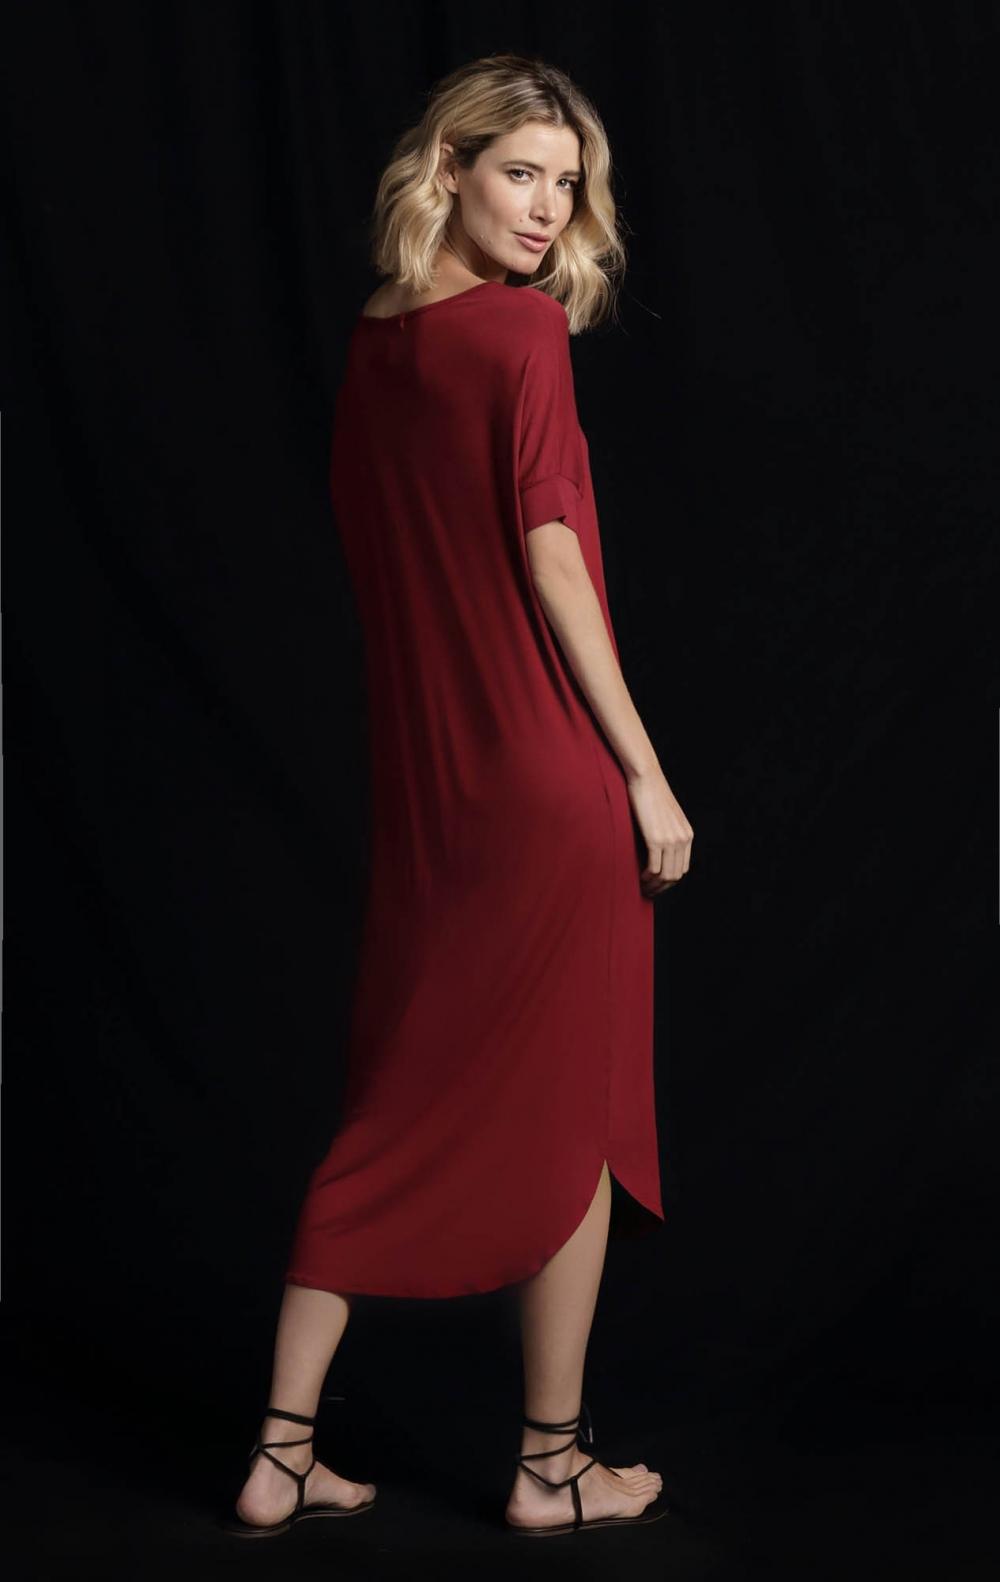 Vestido Malha Tunica Vinho - Foto 2